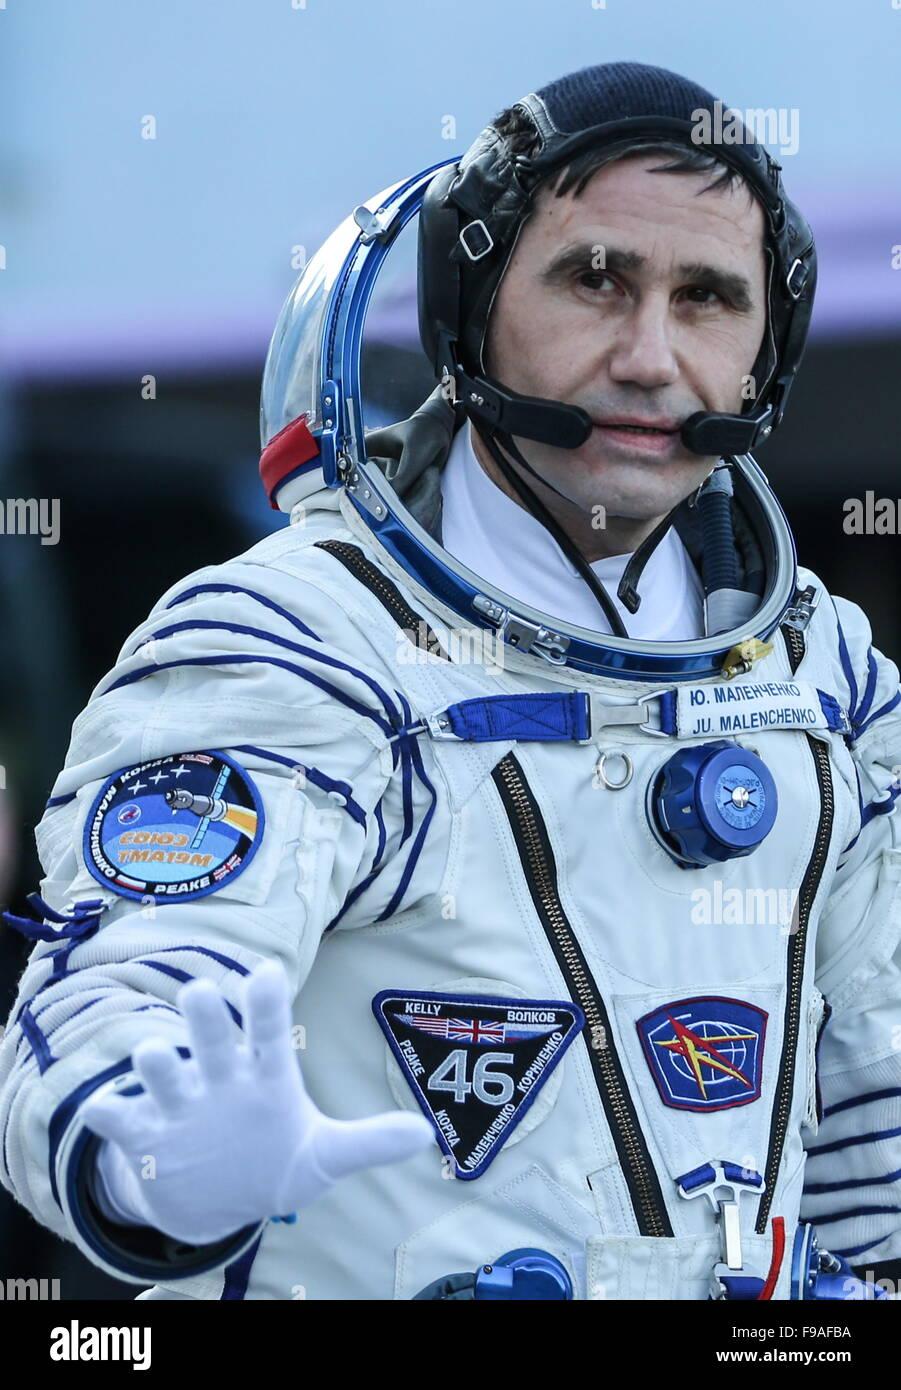 Baikonur, Kazakhstan. 15th Dec, 2015. ISS Expedition 46/47 crew member, Roscosmos cosmonaut Yuri Malenchenko before - Stock Image